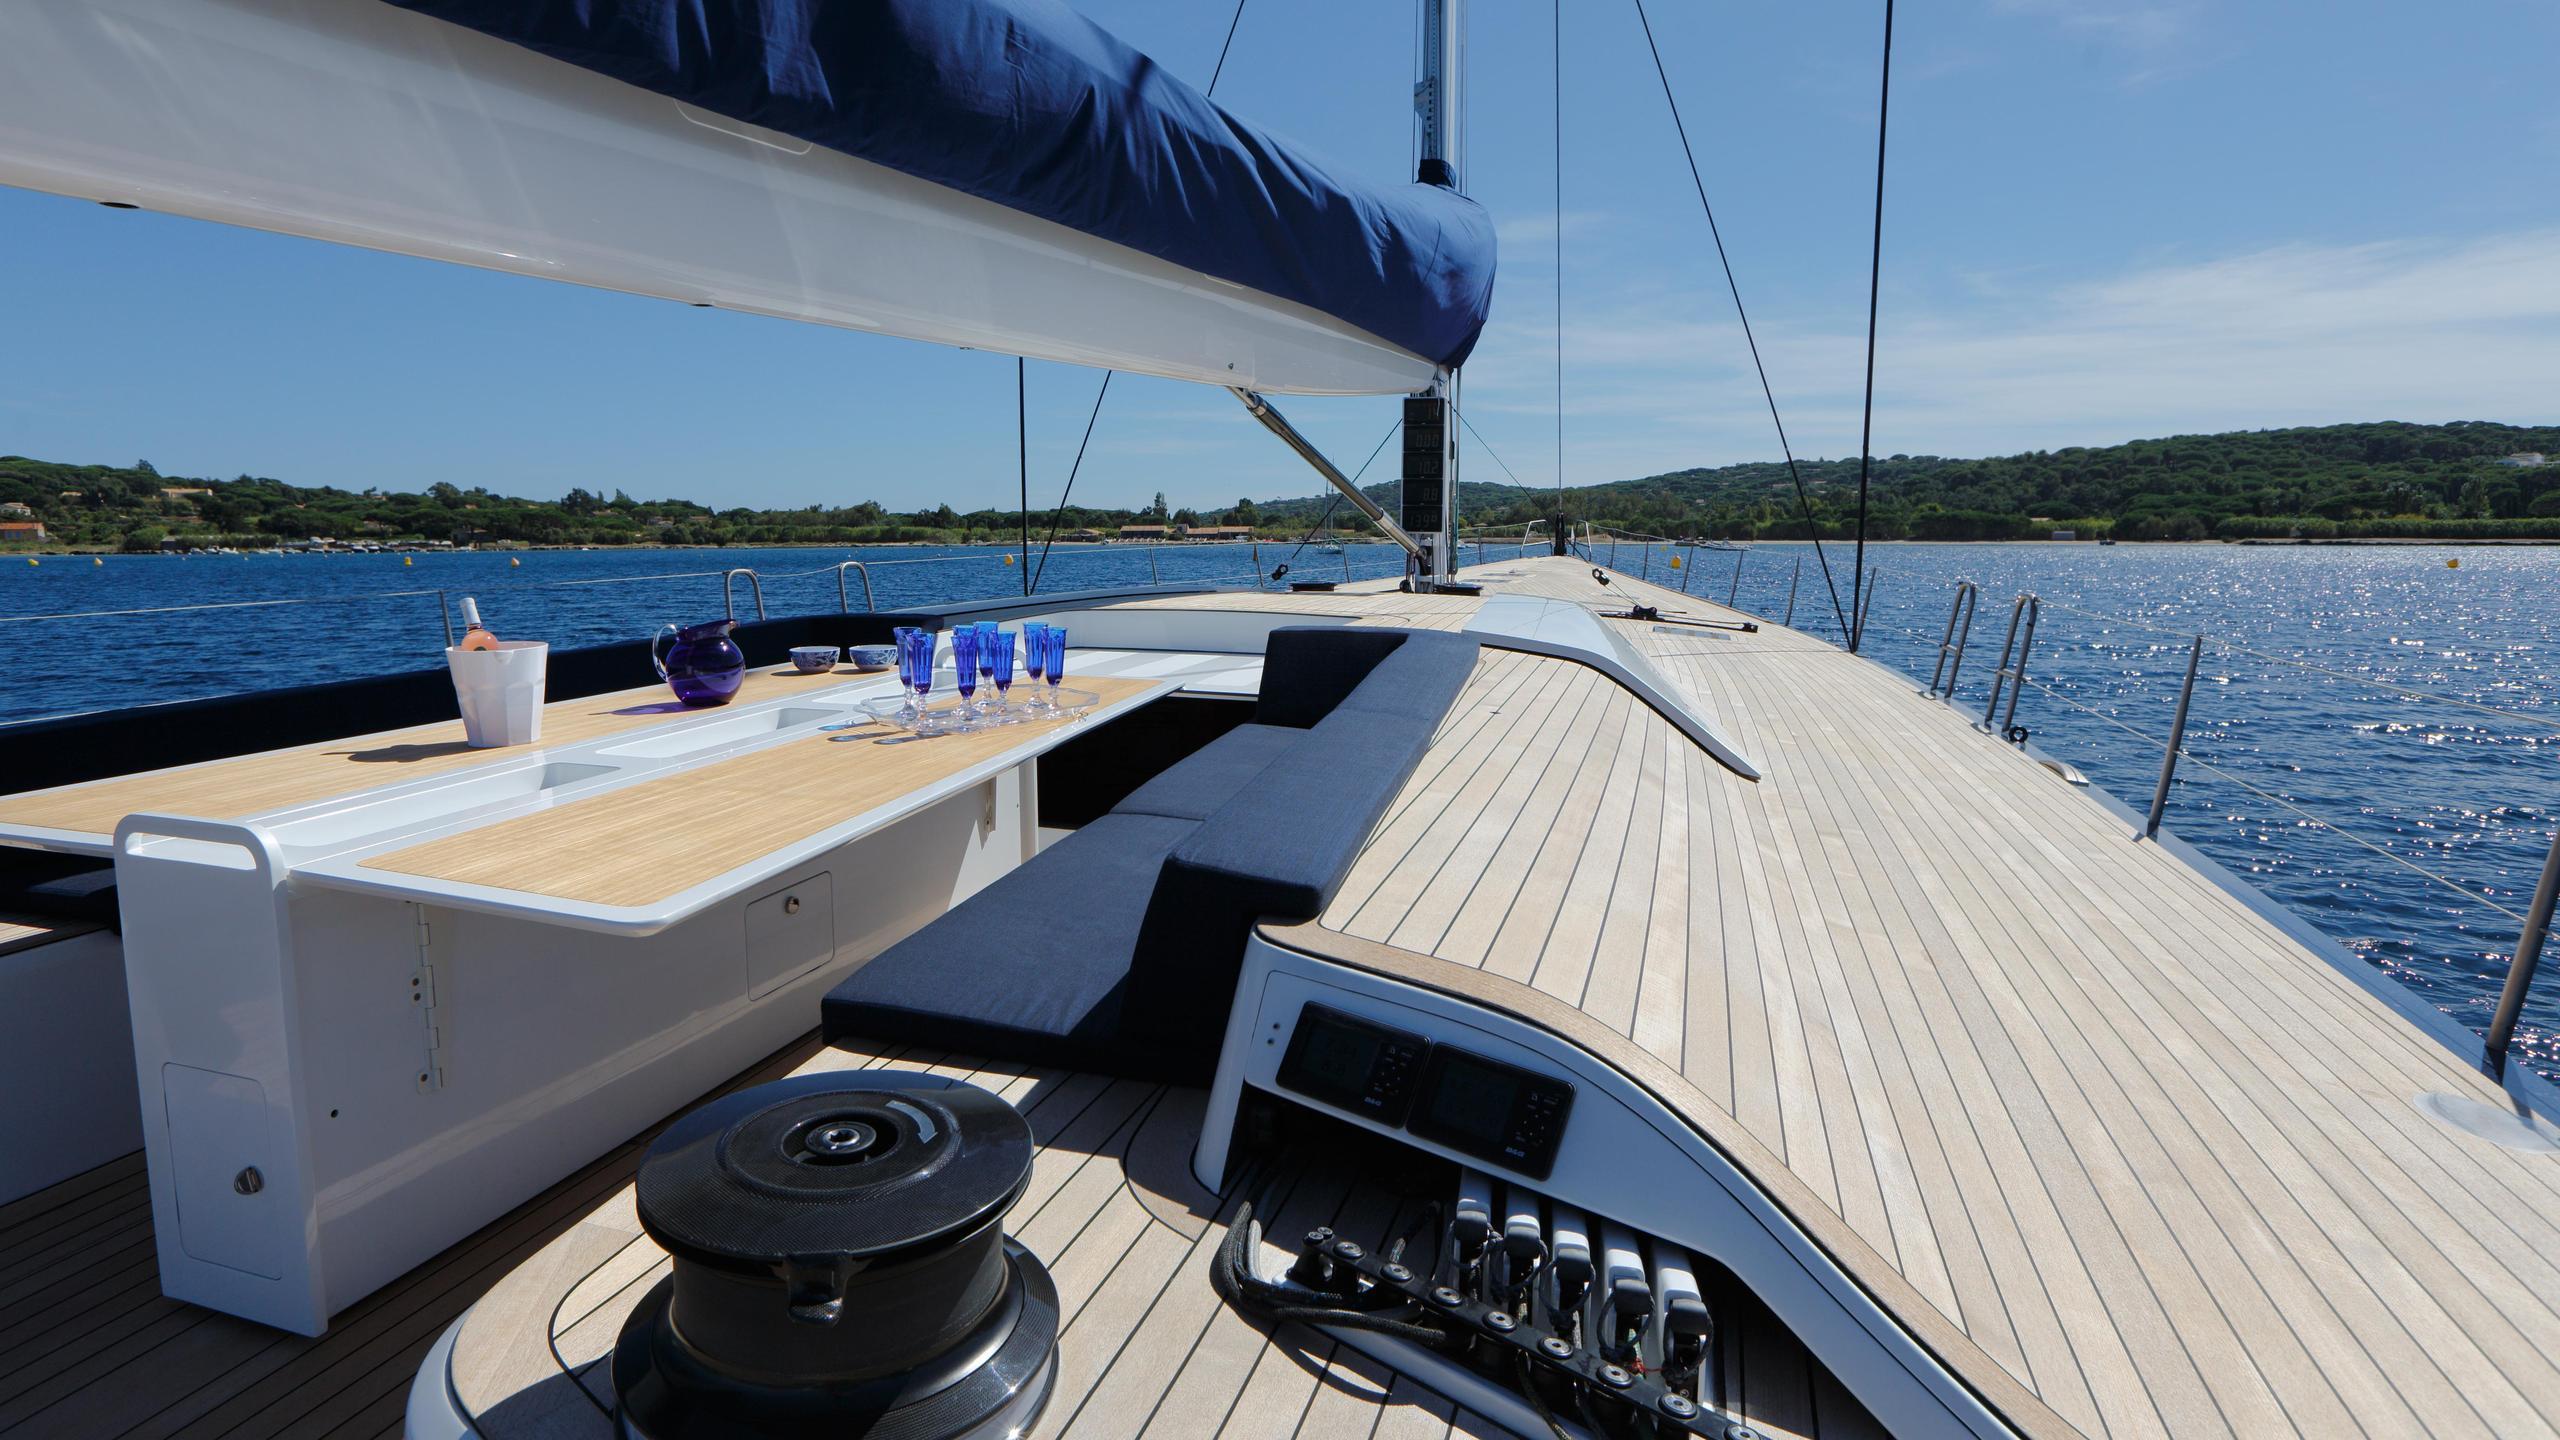 Magic-Carpet-iii-sailing-yacht-wally-21013-30m-deck-table